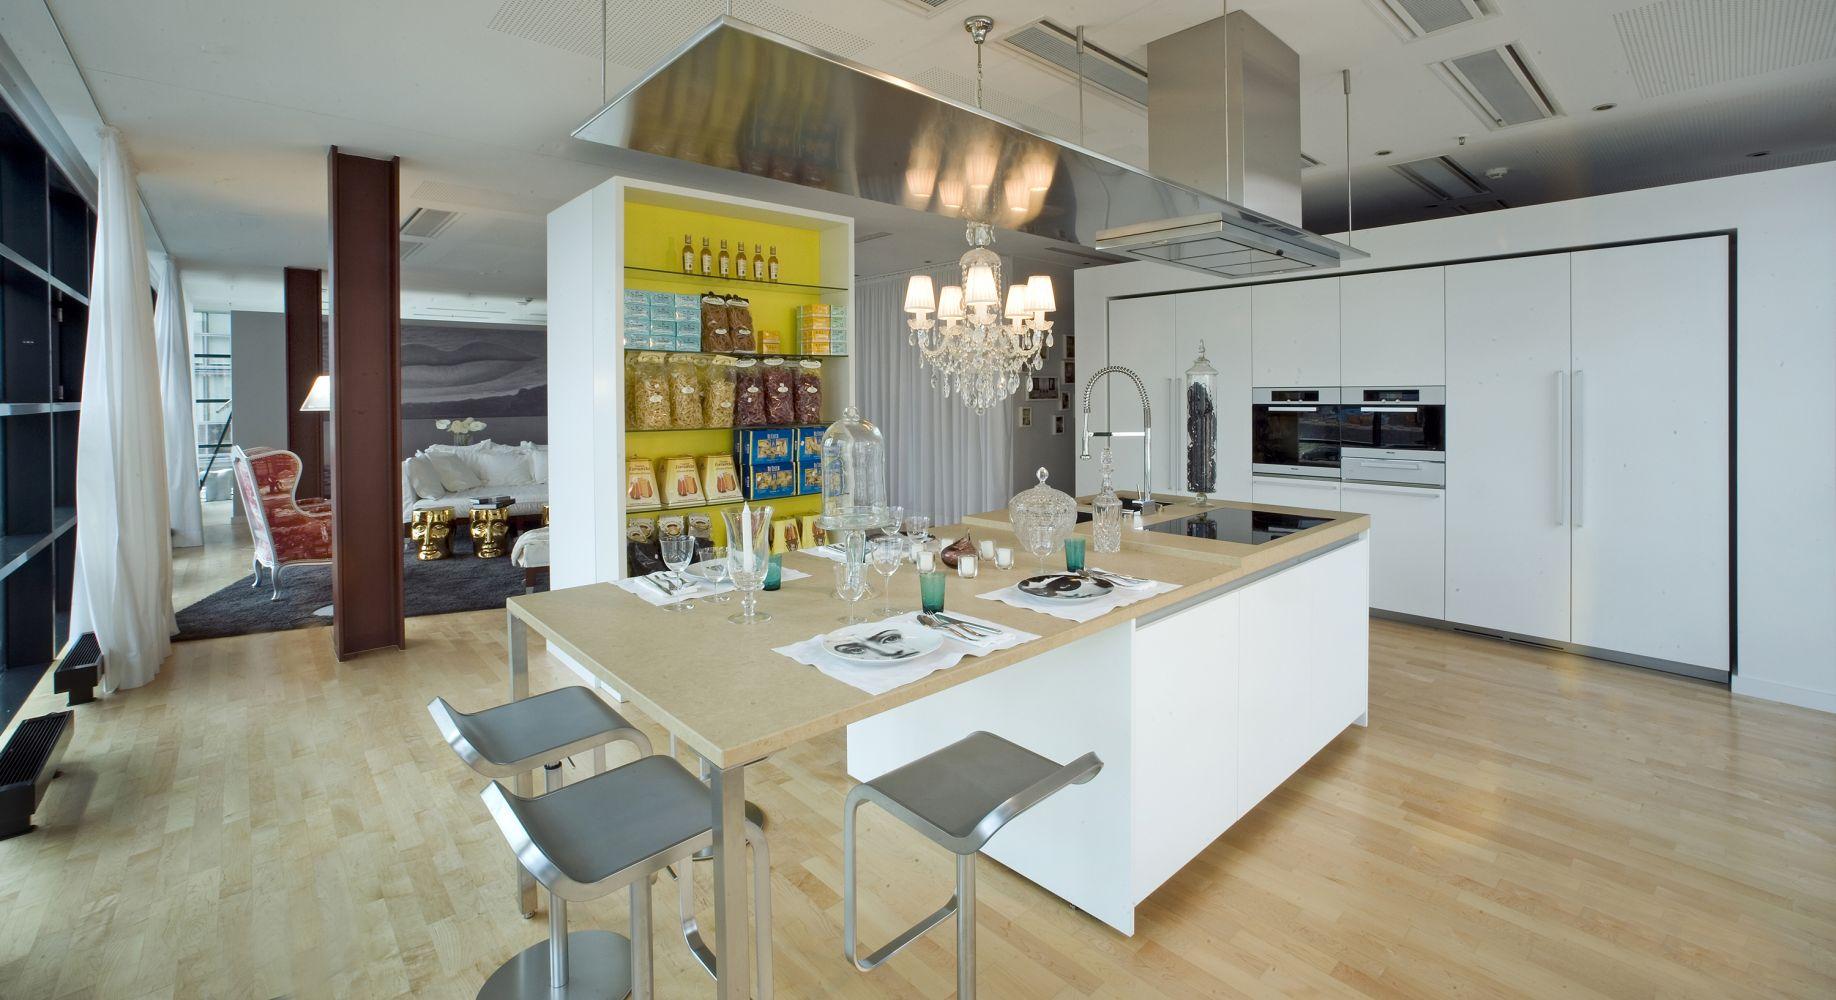 yoo hamburg musterwohnung g rtner internationale m bel. Black Bedroom Furniture Sets. Home Design Ideas